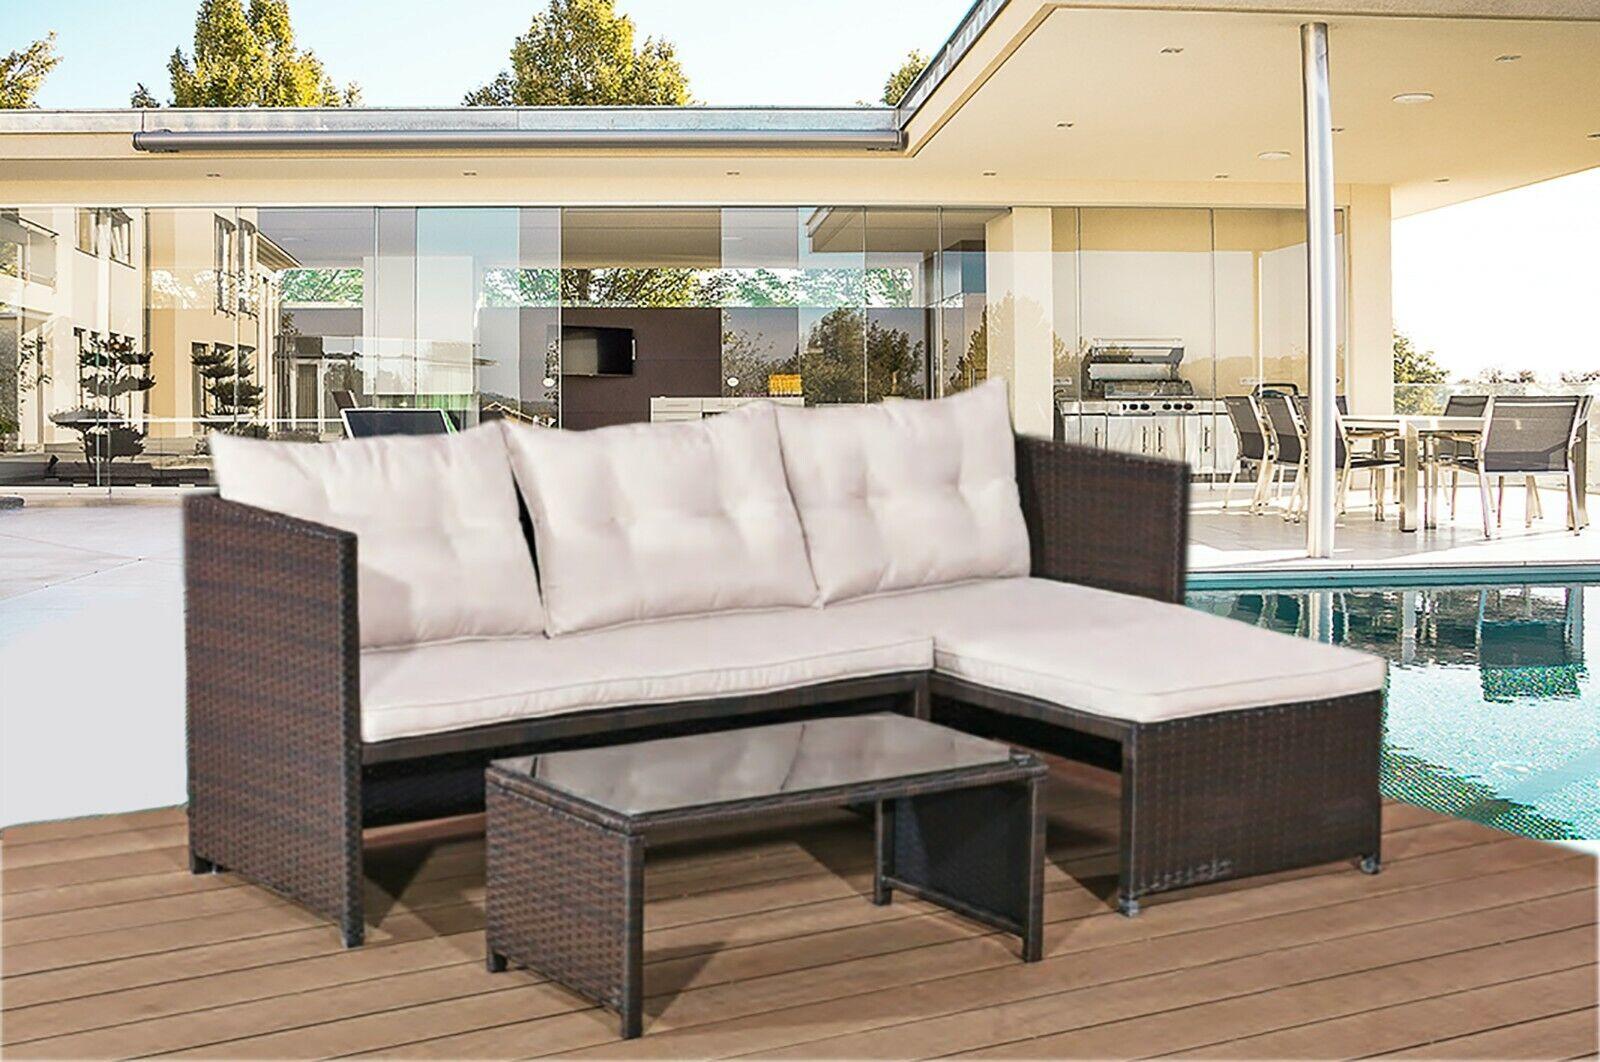 Garden Furniture - Rattan Corner Set Patio Garden Furniture Sofas Conservatory Outdoor Dining Table